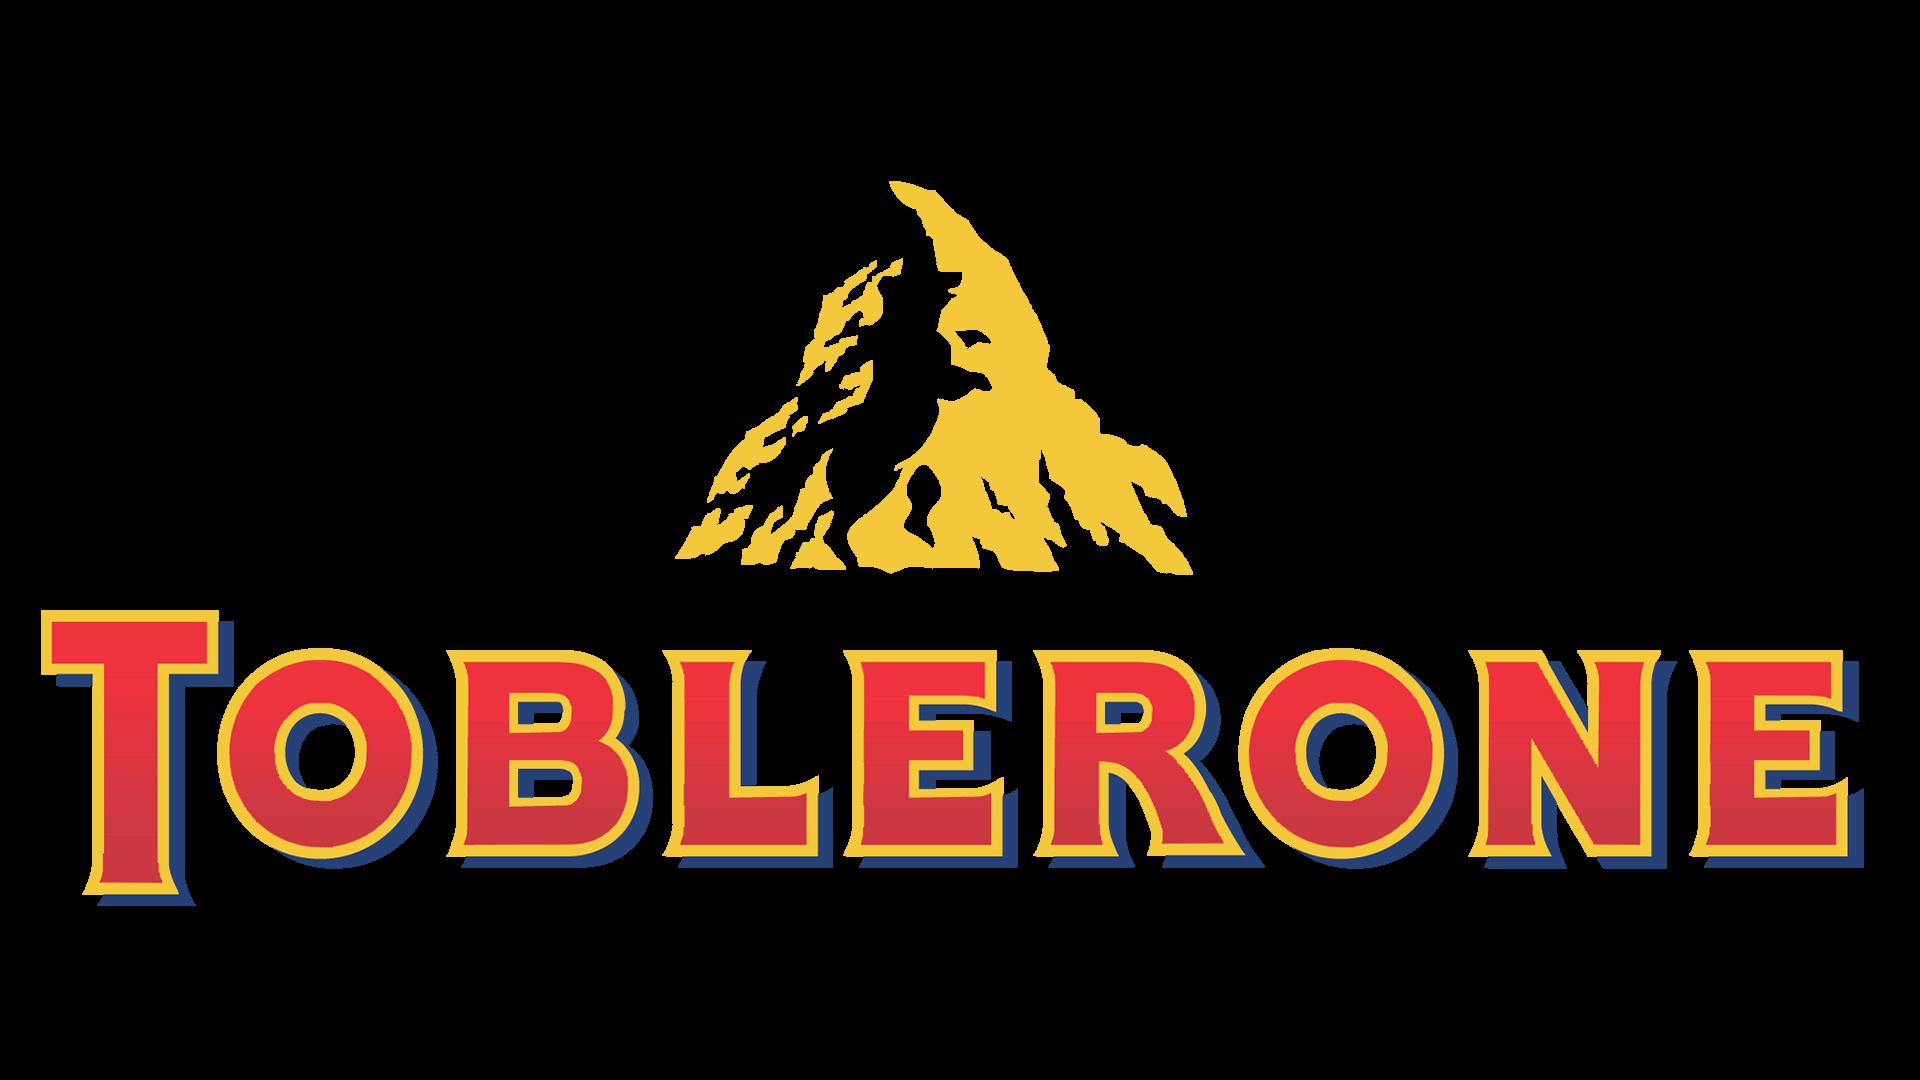 Toblerone-hidden-symbol-logo-example - Undullify